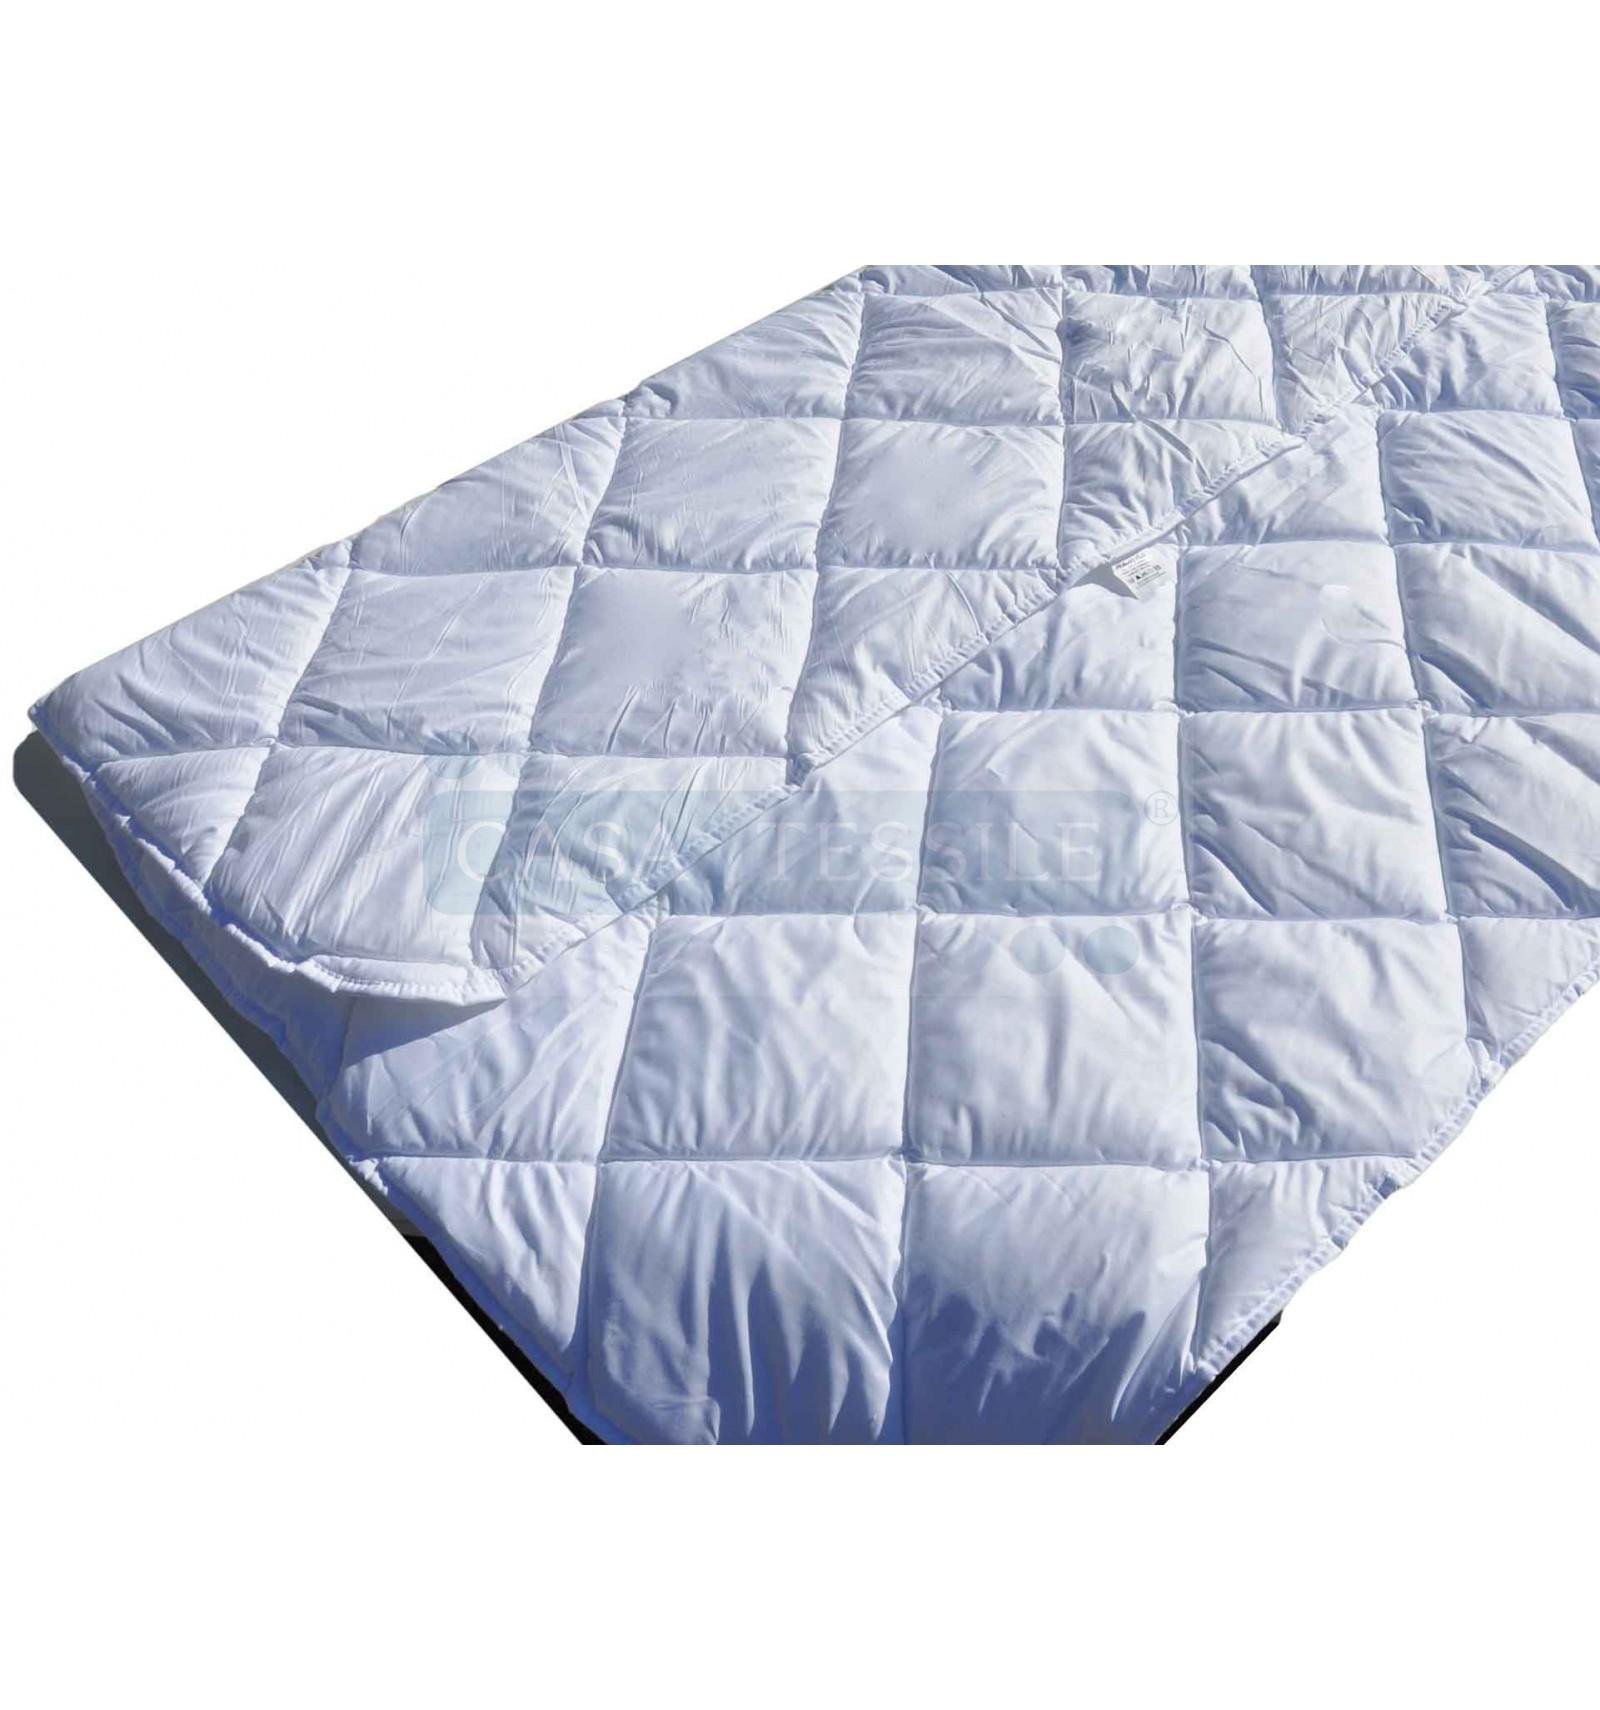 Flo Invernale Synthetische Bettdecken 200x200 Cm